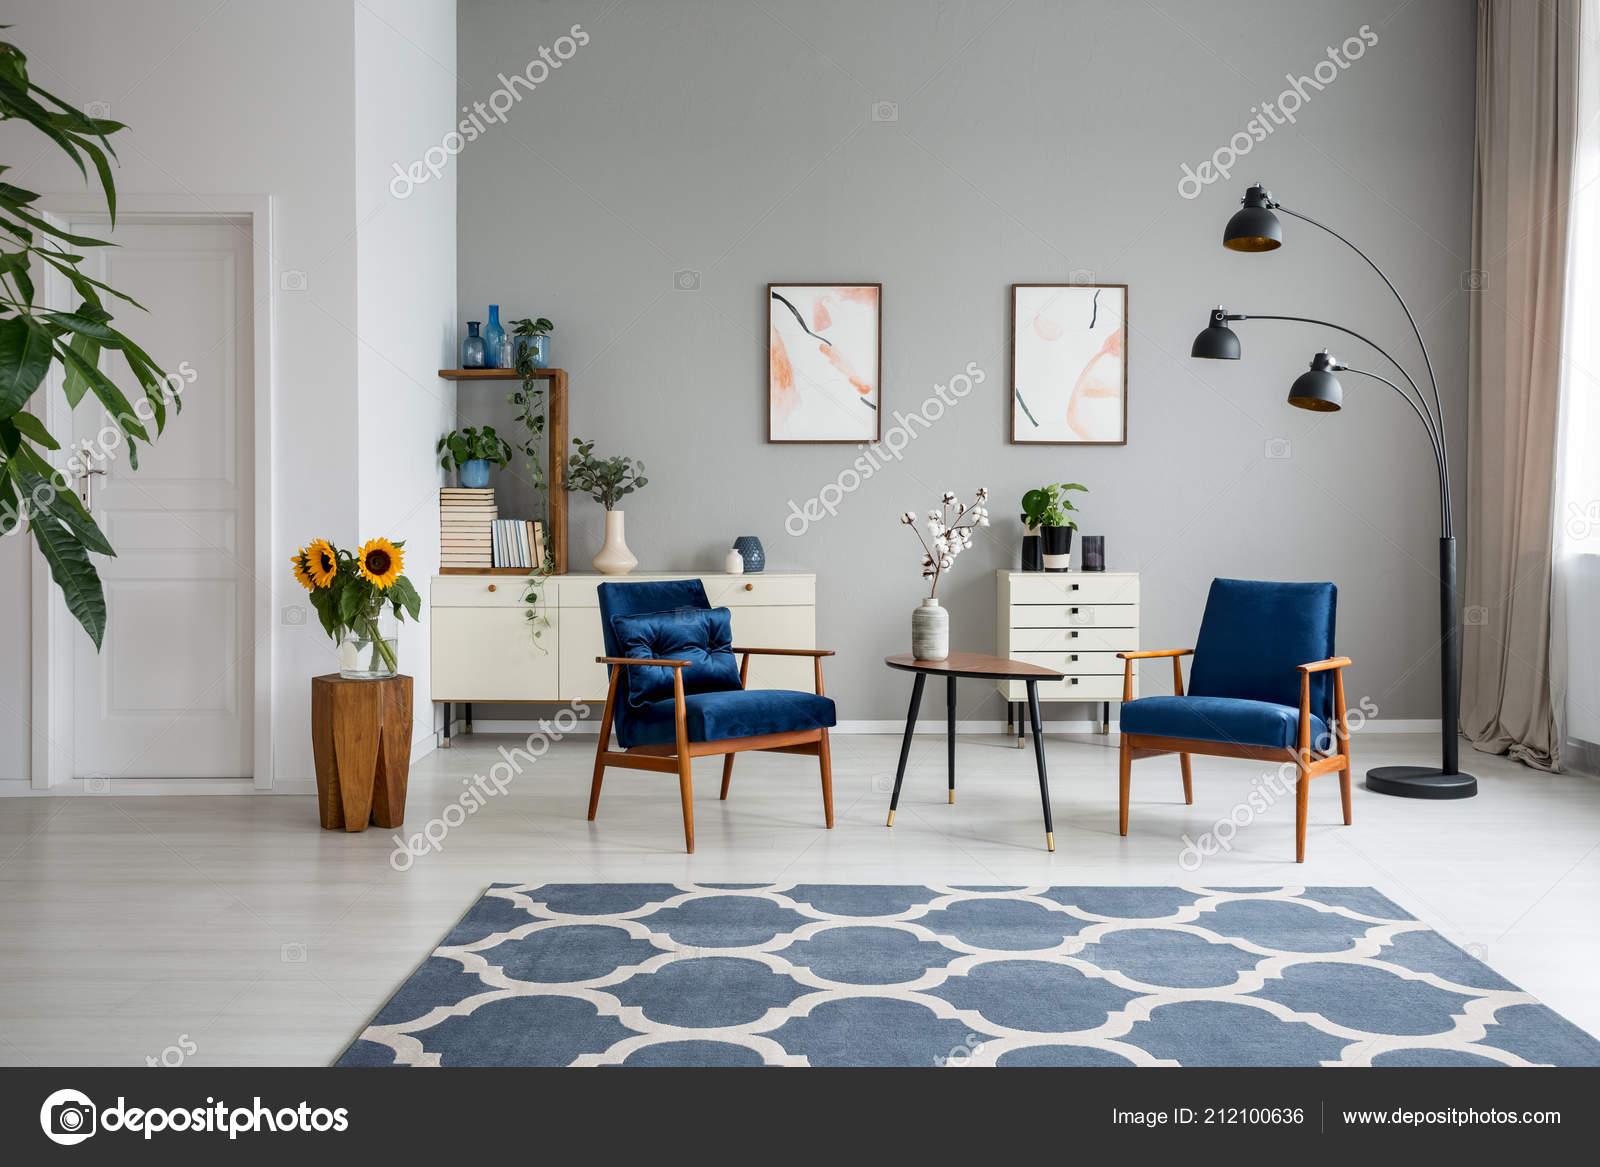 navy blue kitchen rugs large sinks 有图案的蓝色地毯和木制扶手椅宽敞平坦的室内有海报和鲜花真实照片 图库 有图案的蓝色地毯和木制扶手椅宽敞平坦的室内有